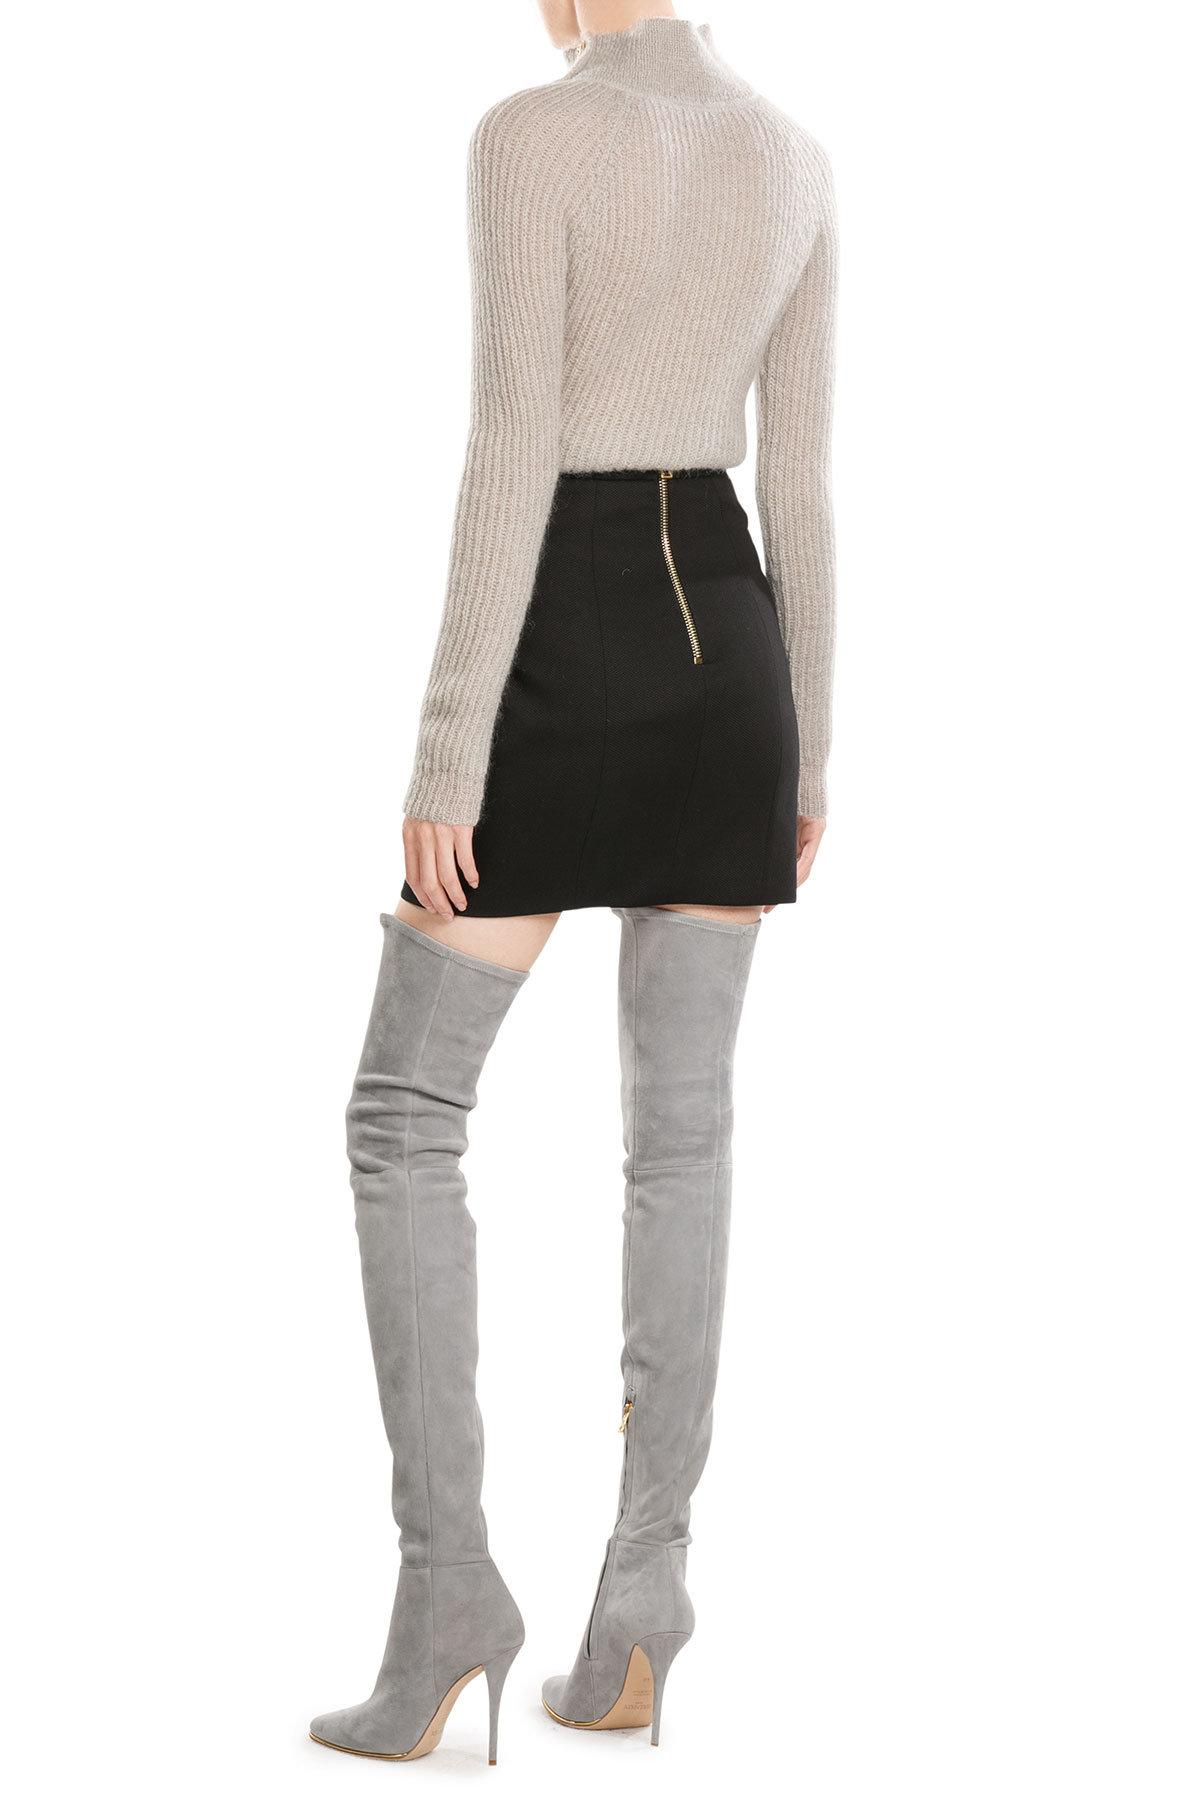 Lyst Balmain Suede Thigh High Boots In Black